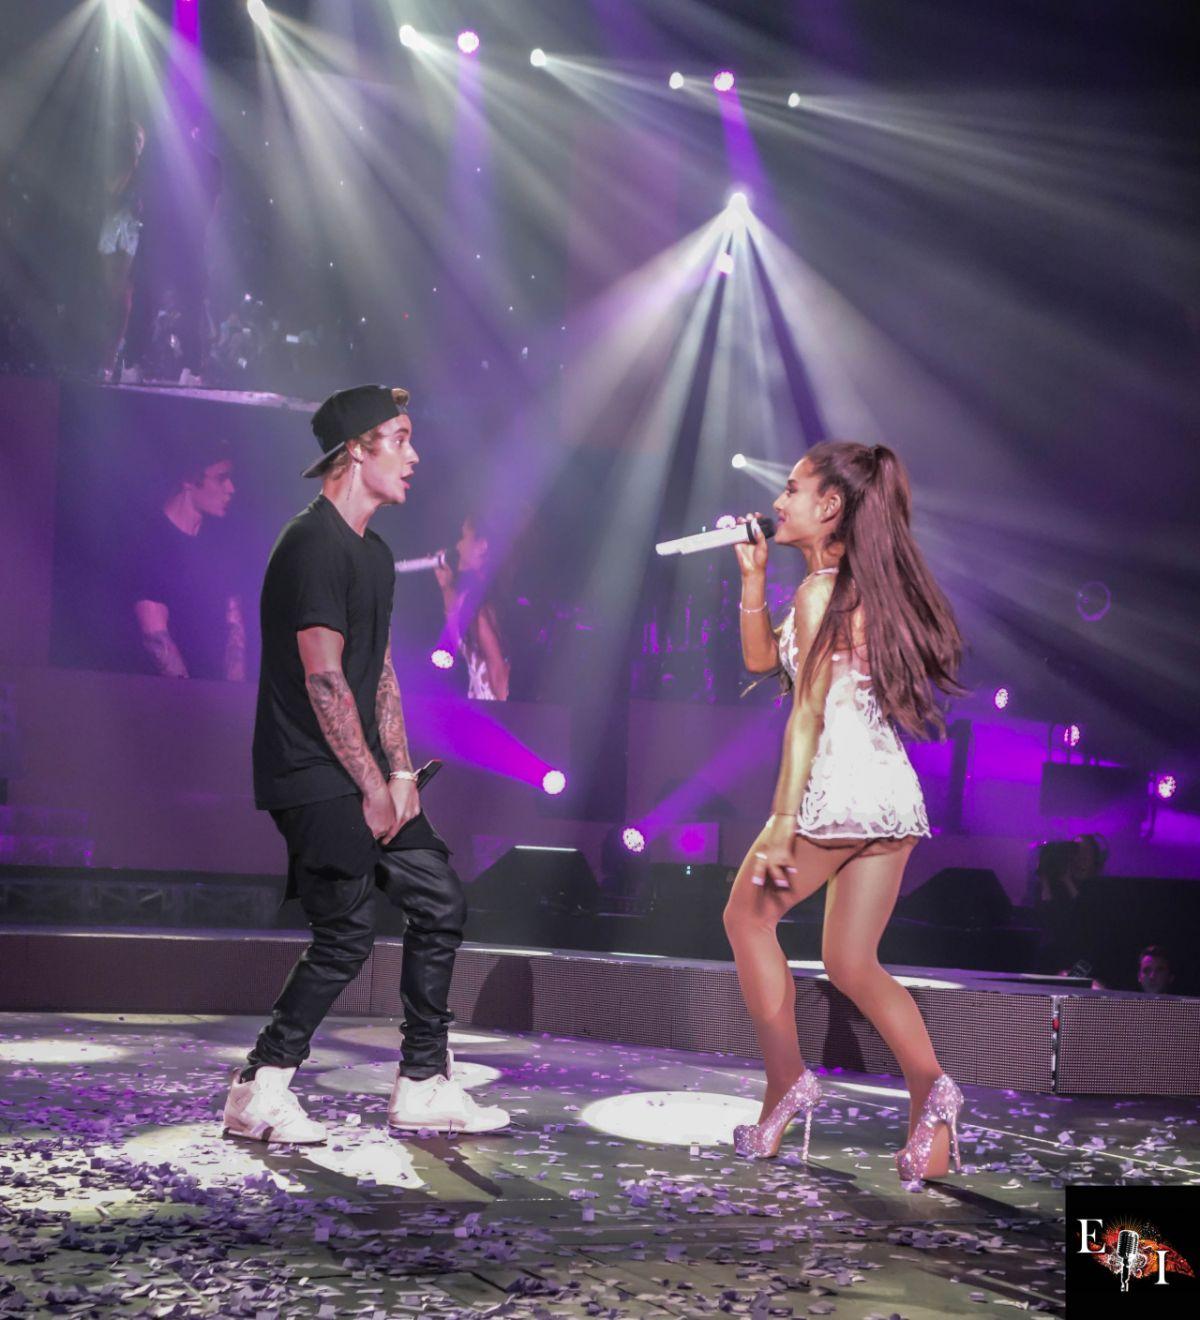 Justin Bieber Ariana Grande Tour Ariana Grande And Justin